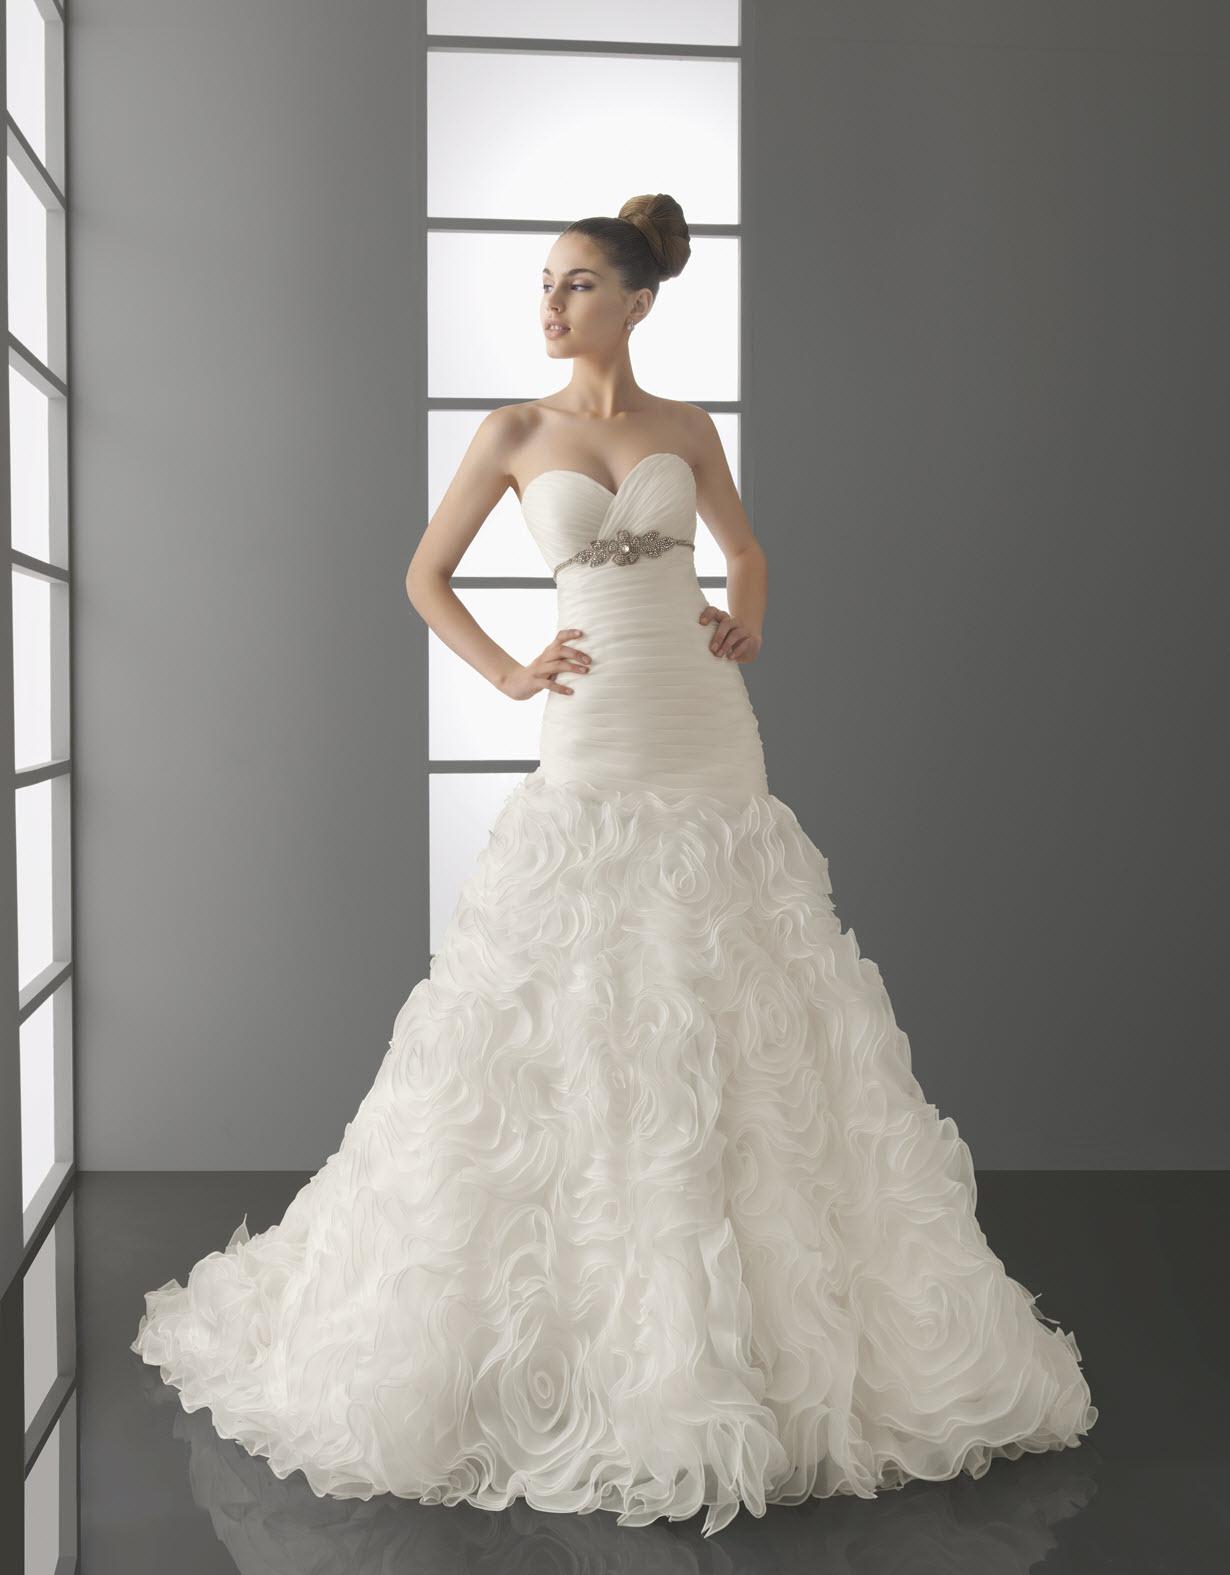 paris wedding dress aire barcelona spring 2012 bridal gown